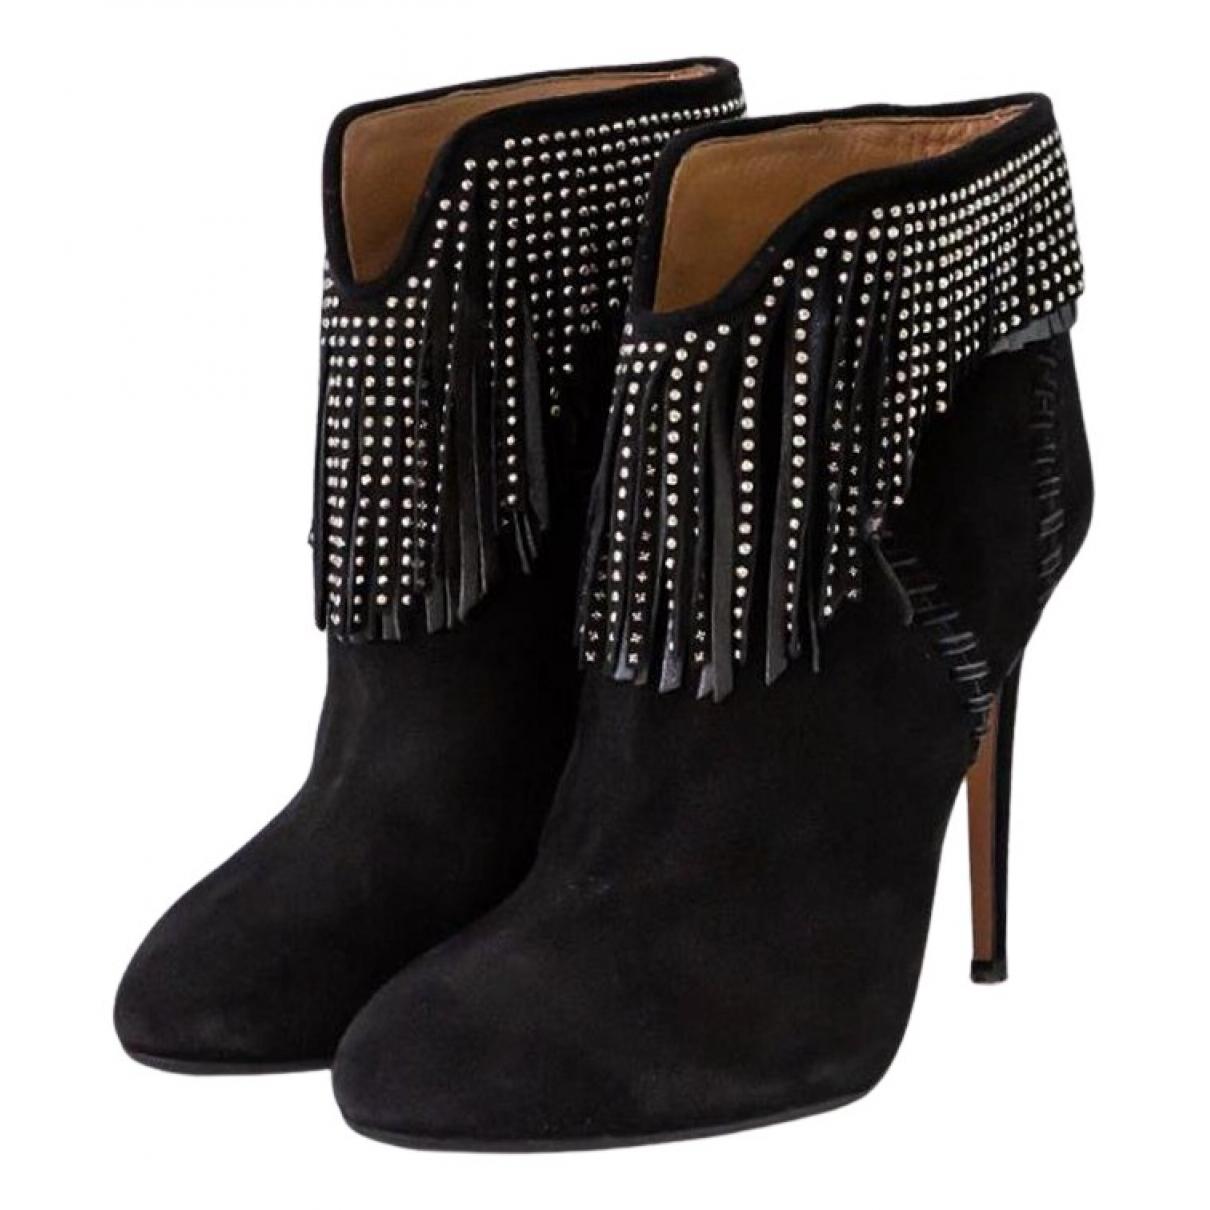 Aquazzura N Black Suede Ankle boots for Women 37 EU